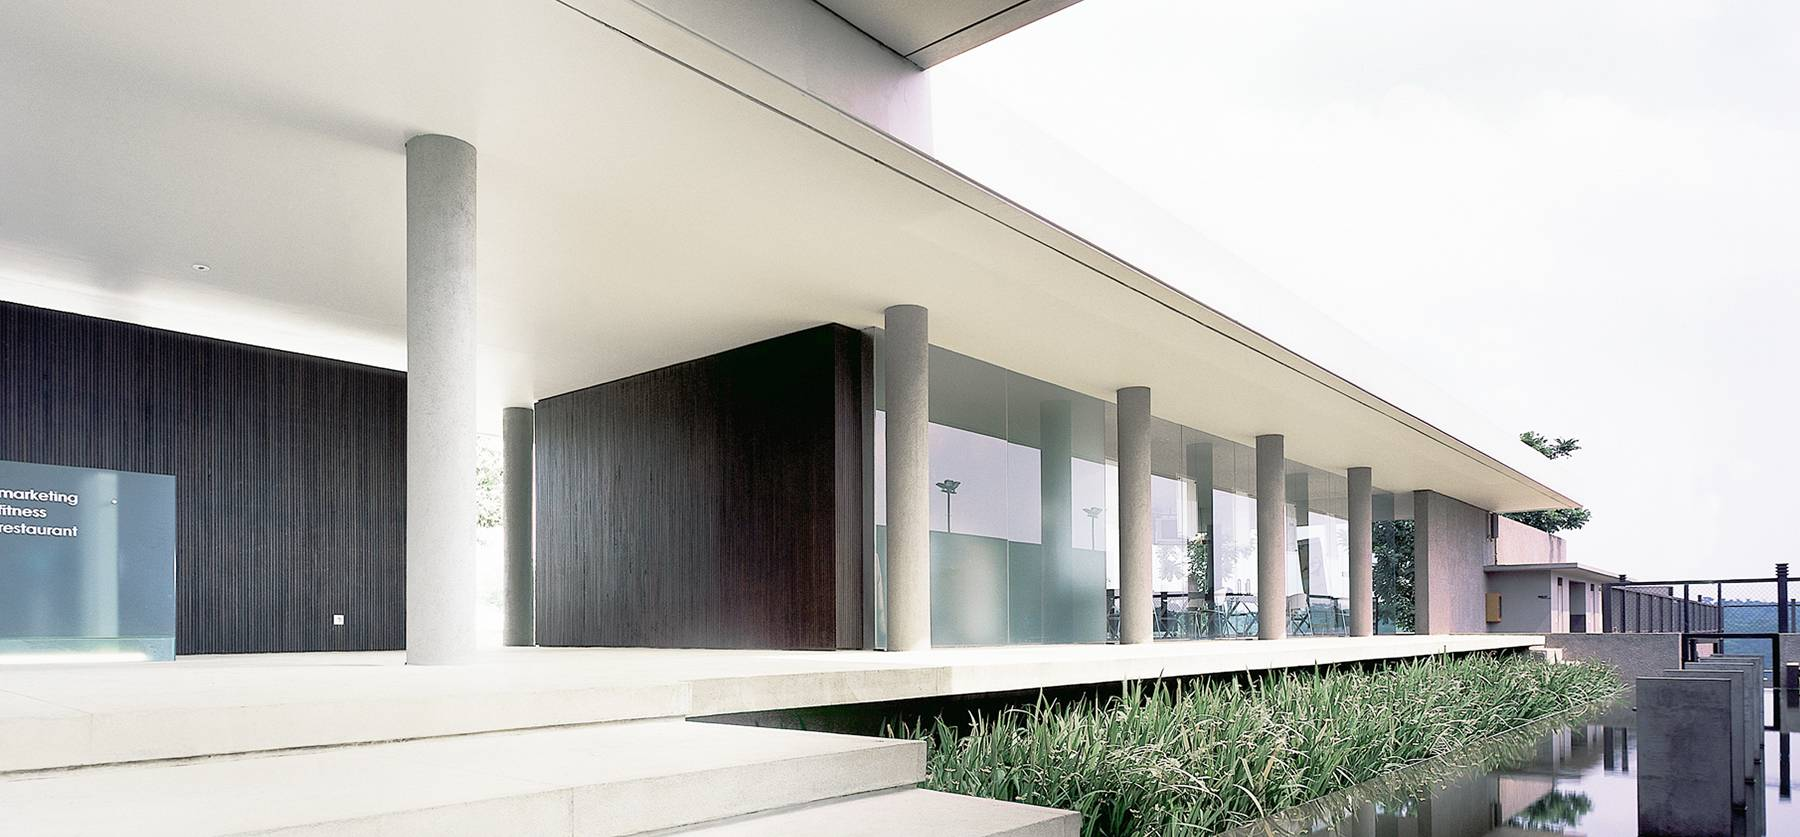 Antony Liu + Ferry Ridwan / Studio Tonton Bukit Golf Club House Cimanggis Cimanggis Exterior Tropical  8014